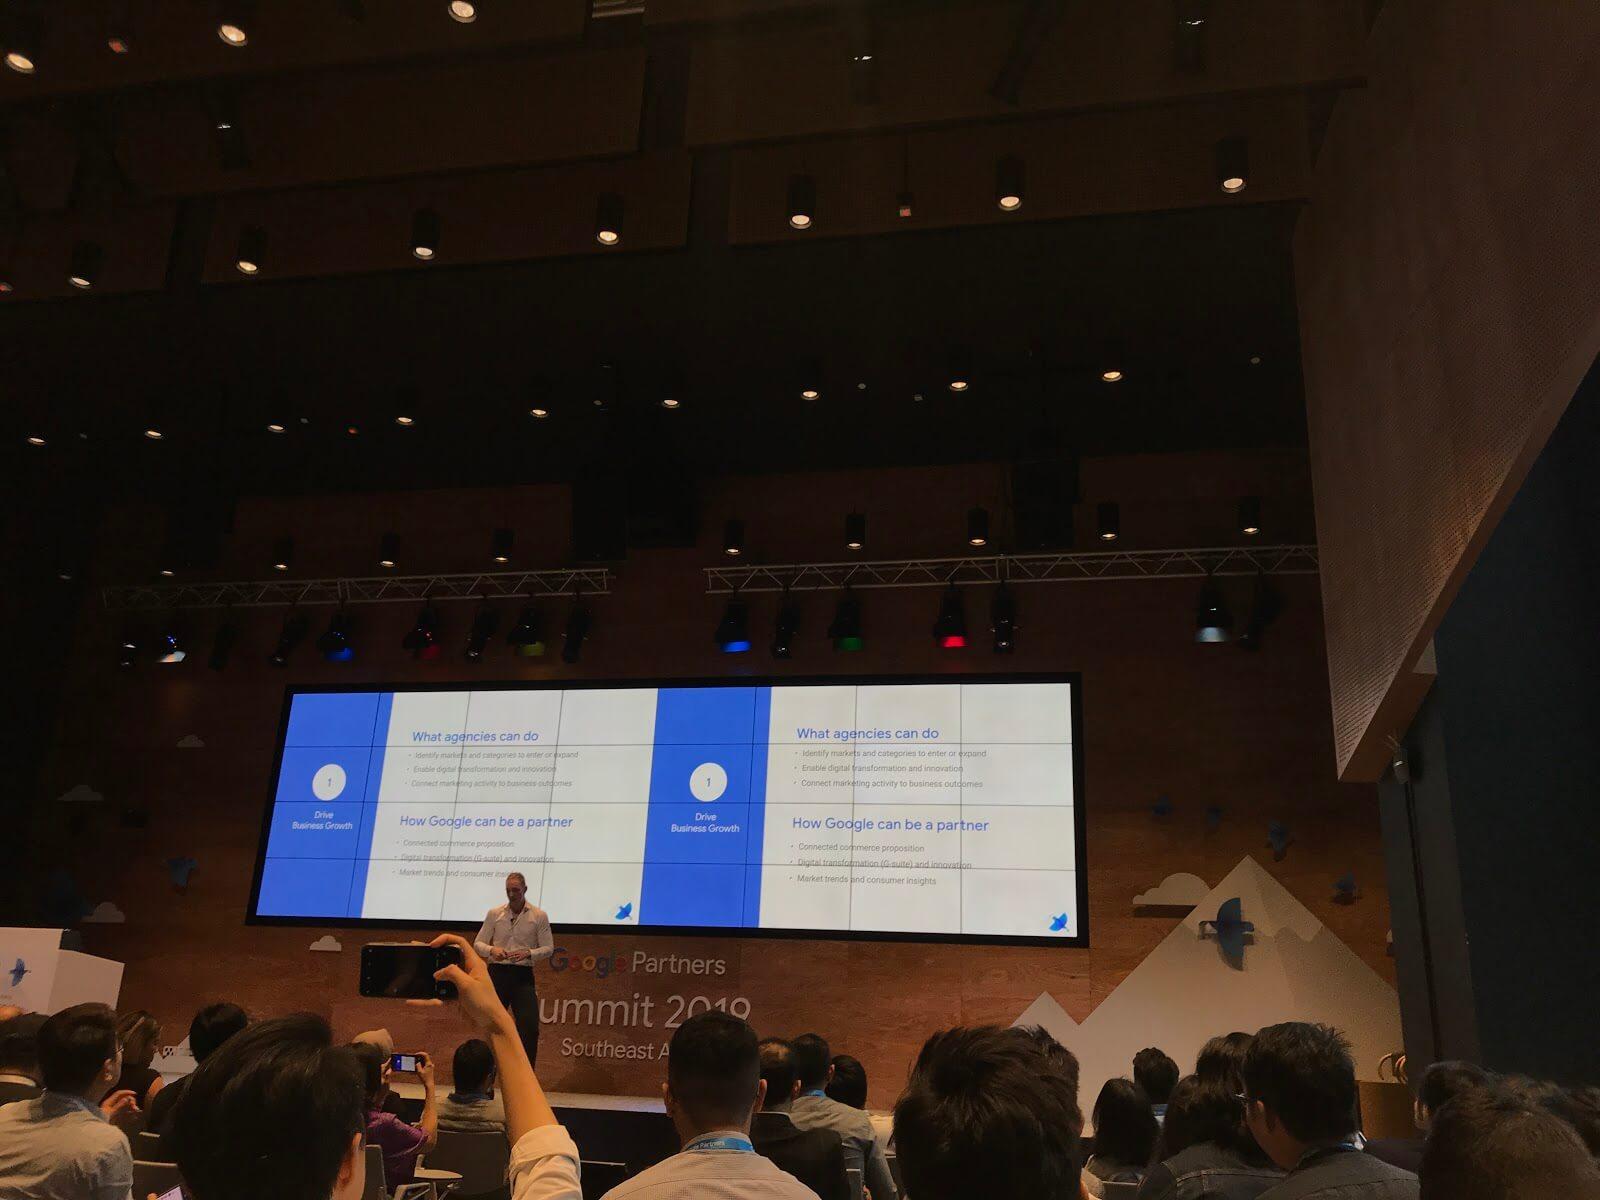 tuong-lai-Agency-tại-google-summit